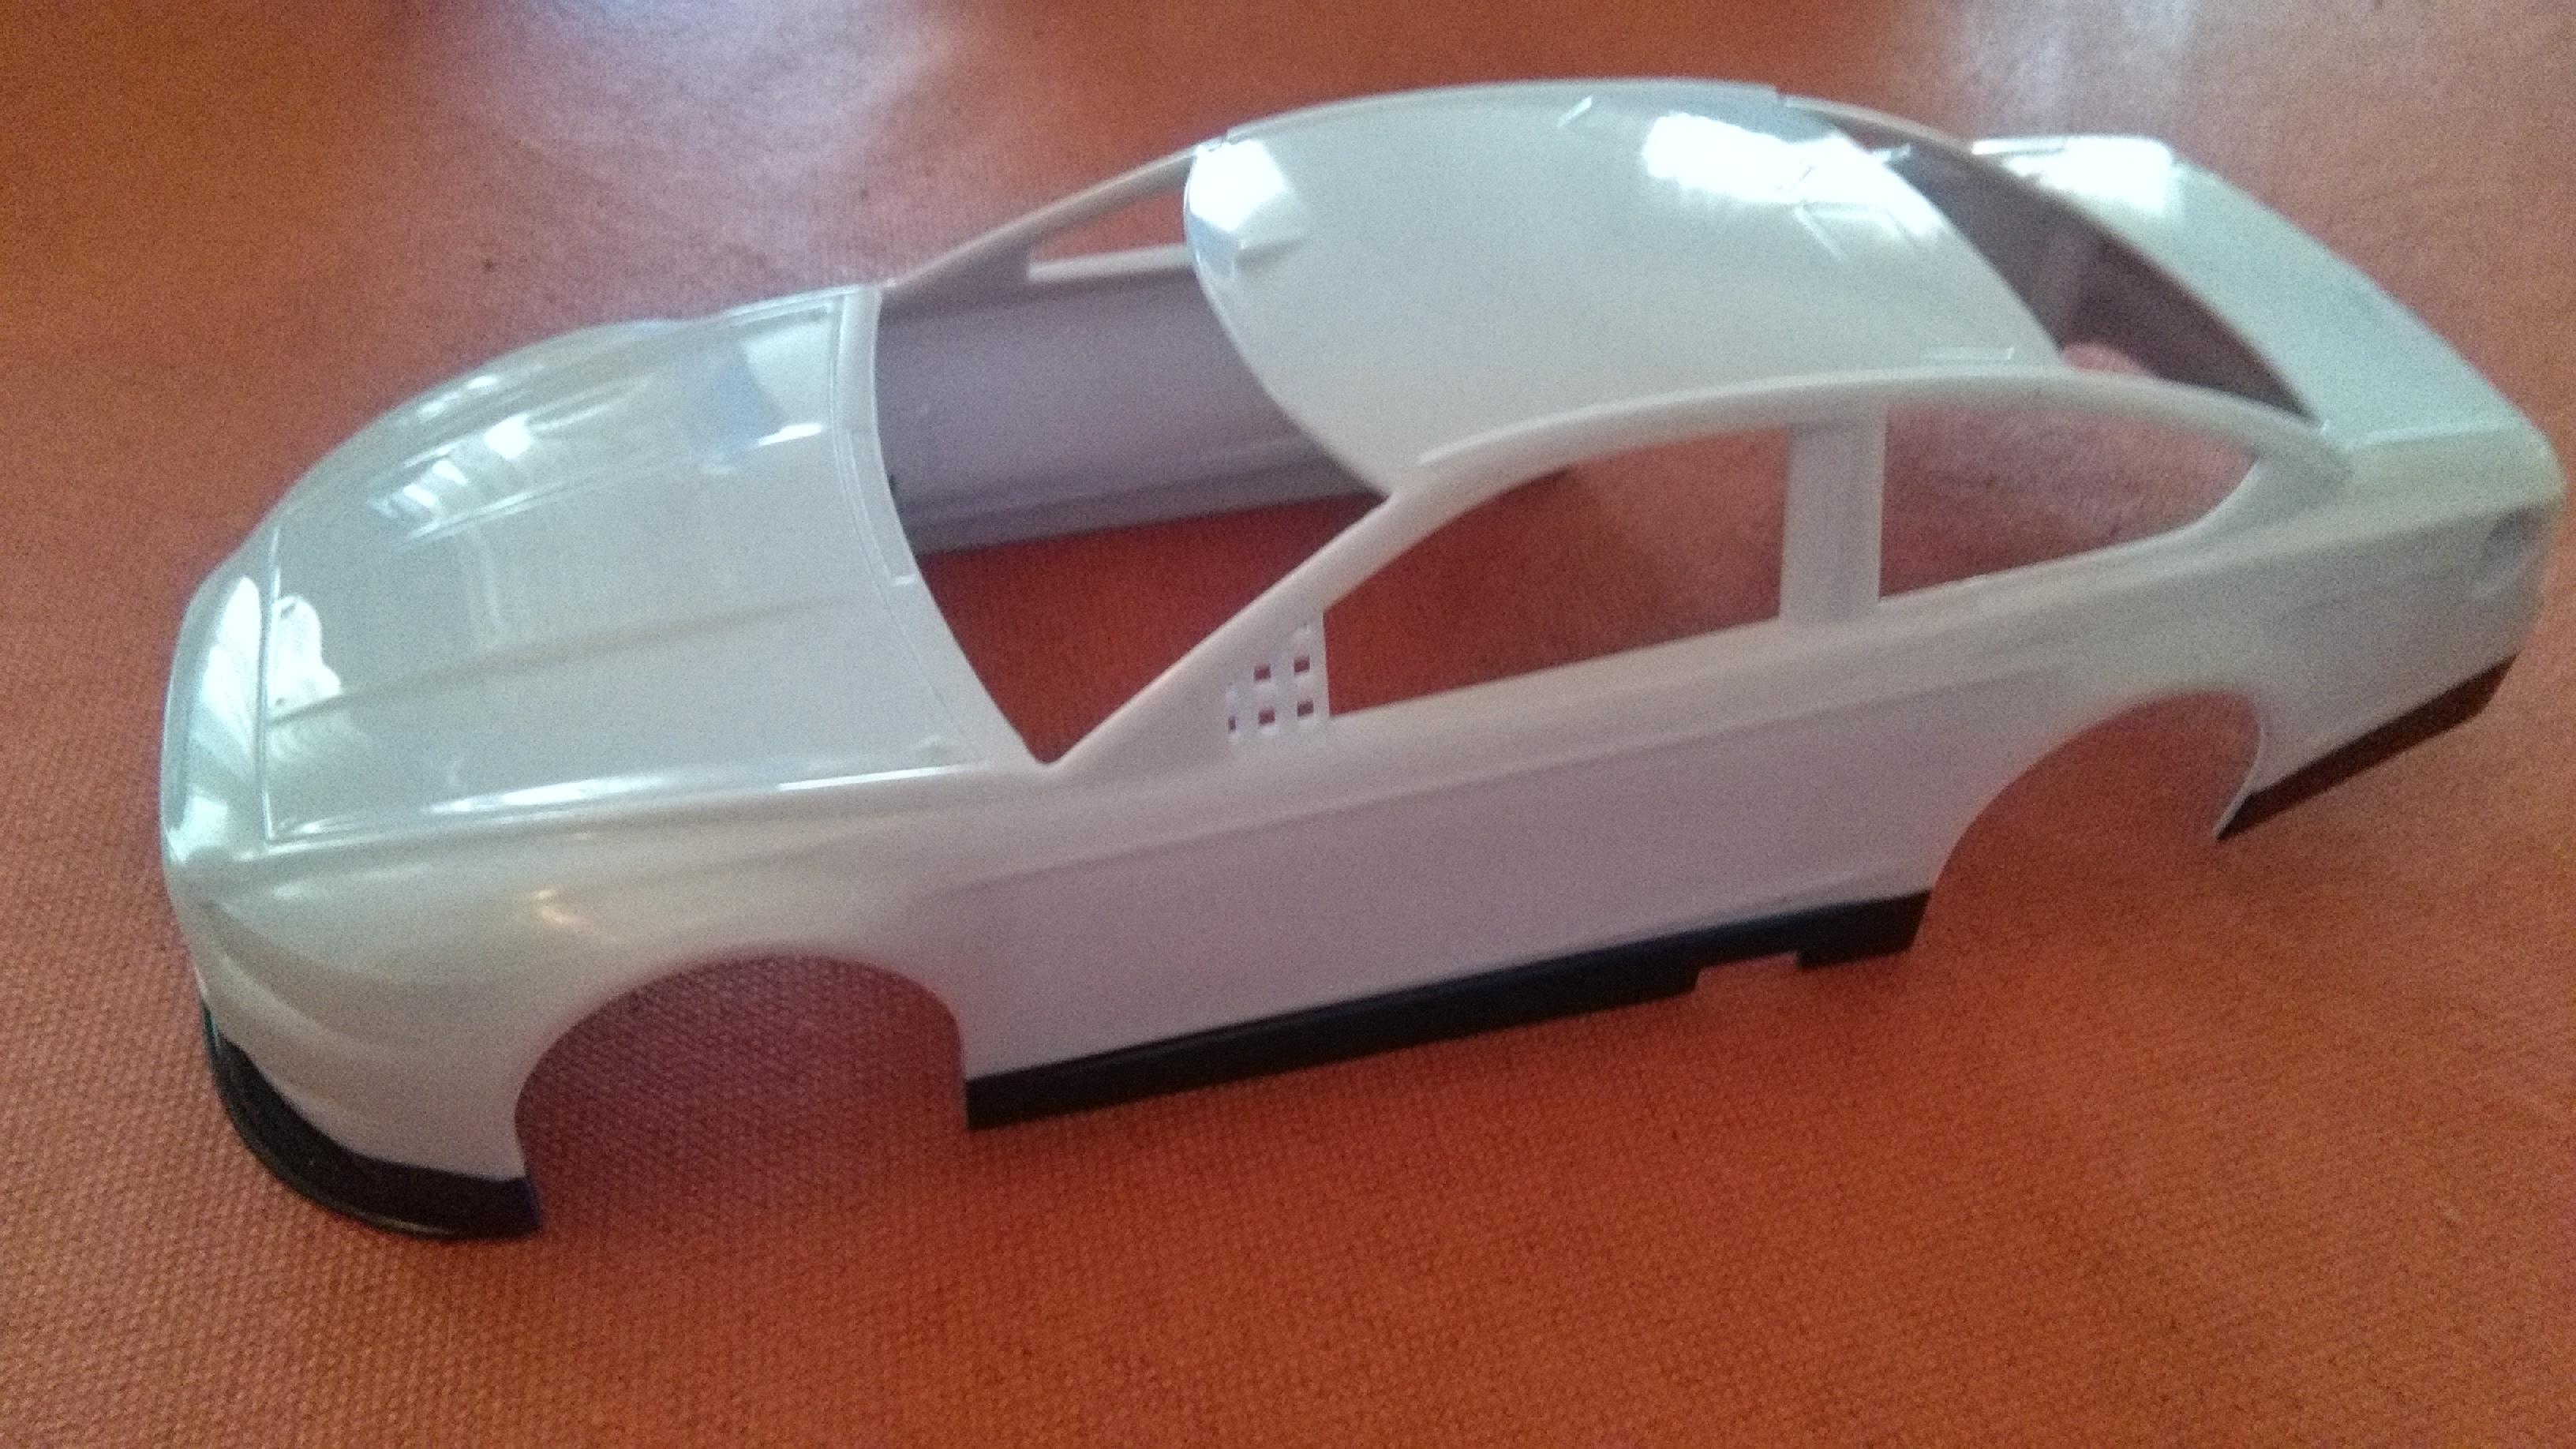 Ford Fusion Penskee 2014 #2 Brad K. Miller Lite - CHASE Version 199424IMG20160123152634